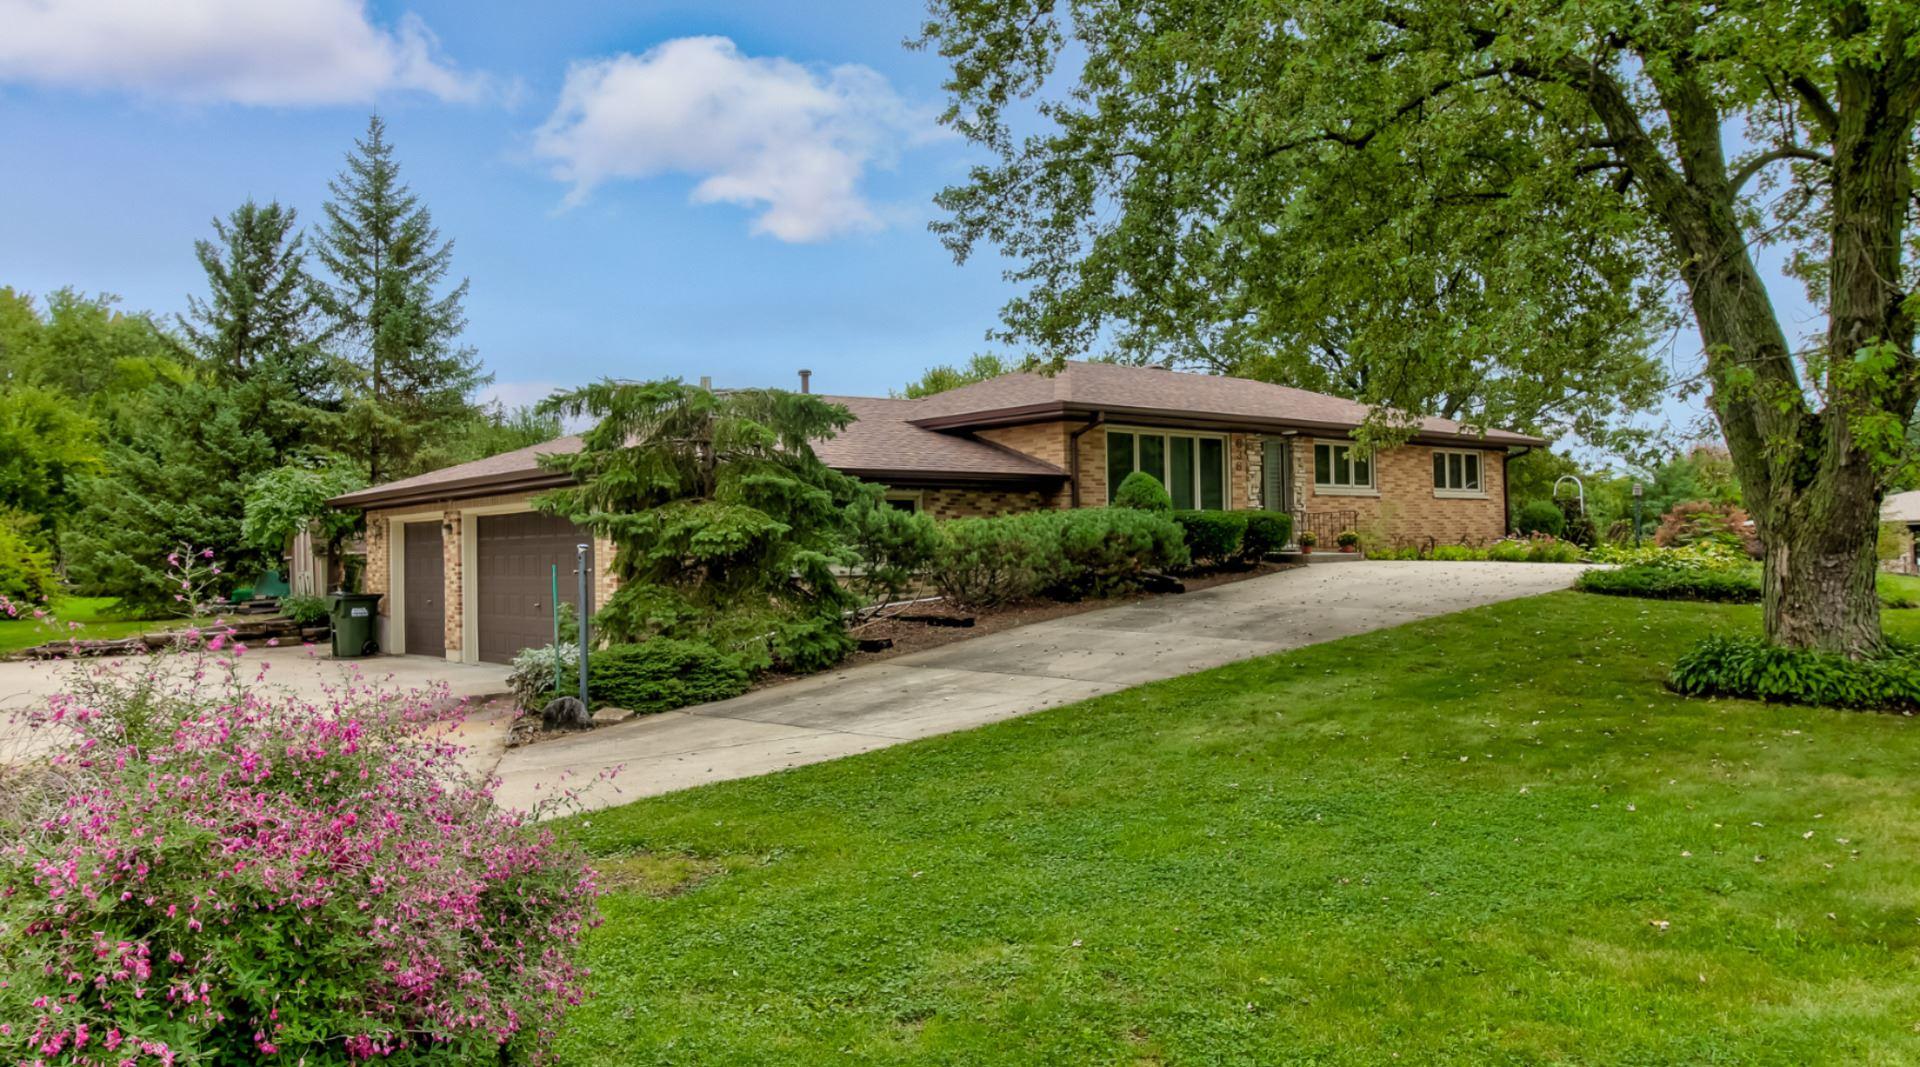 636 Greenbriar Lane, Schaumburg, IL 60193 - #: 11248557